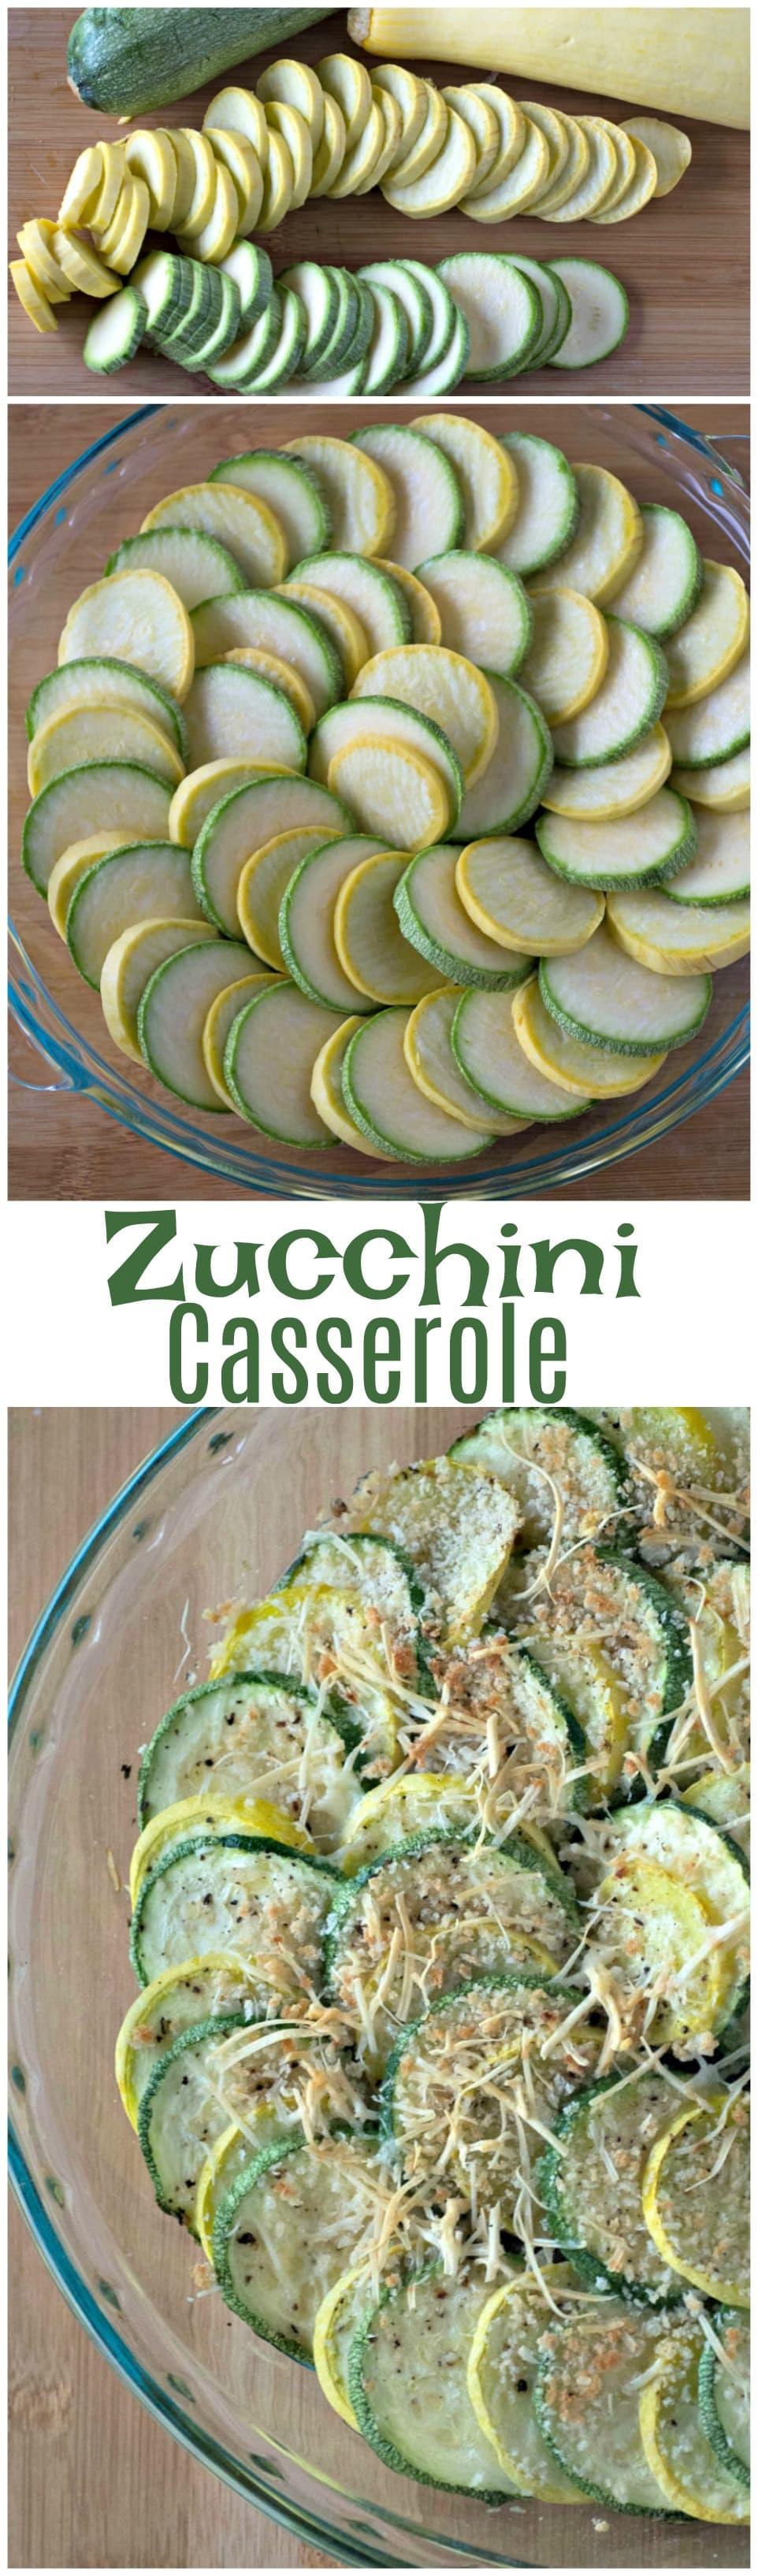 Zucchini Casserole Recipe | Summer Squash Casserole | Healthy Squash Casserole | Easy Thanksgiving Side Dish | Healthy Vegetable Casserole